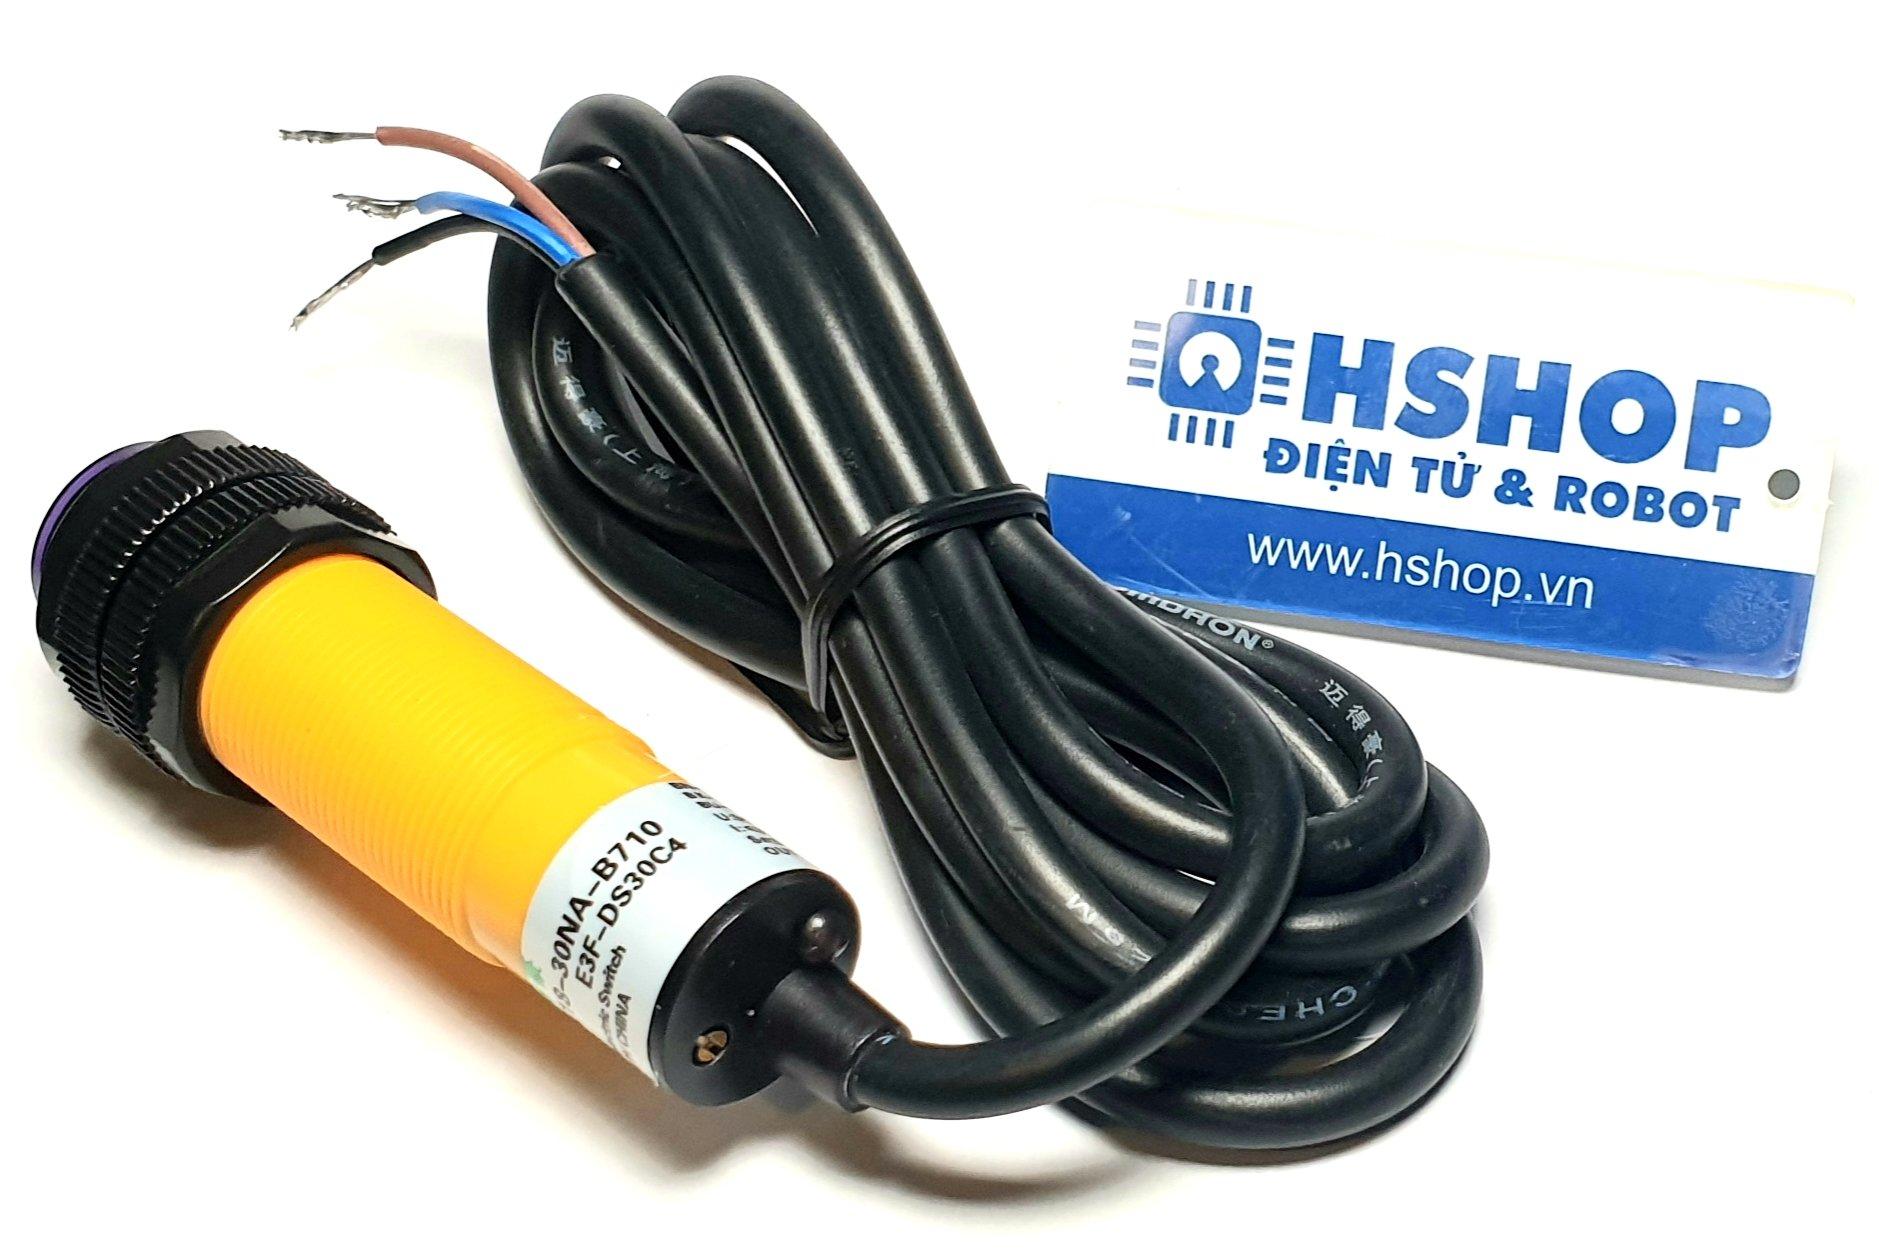 Cảm biến vật cản hồng ngoại E3F-DS30C4 Adjustable IR Infrared Proximity Sensor